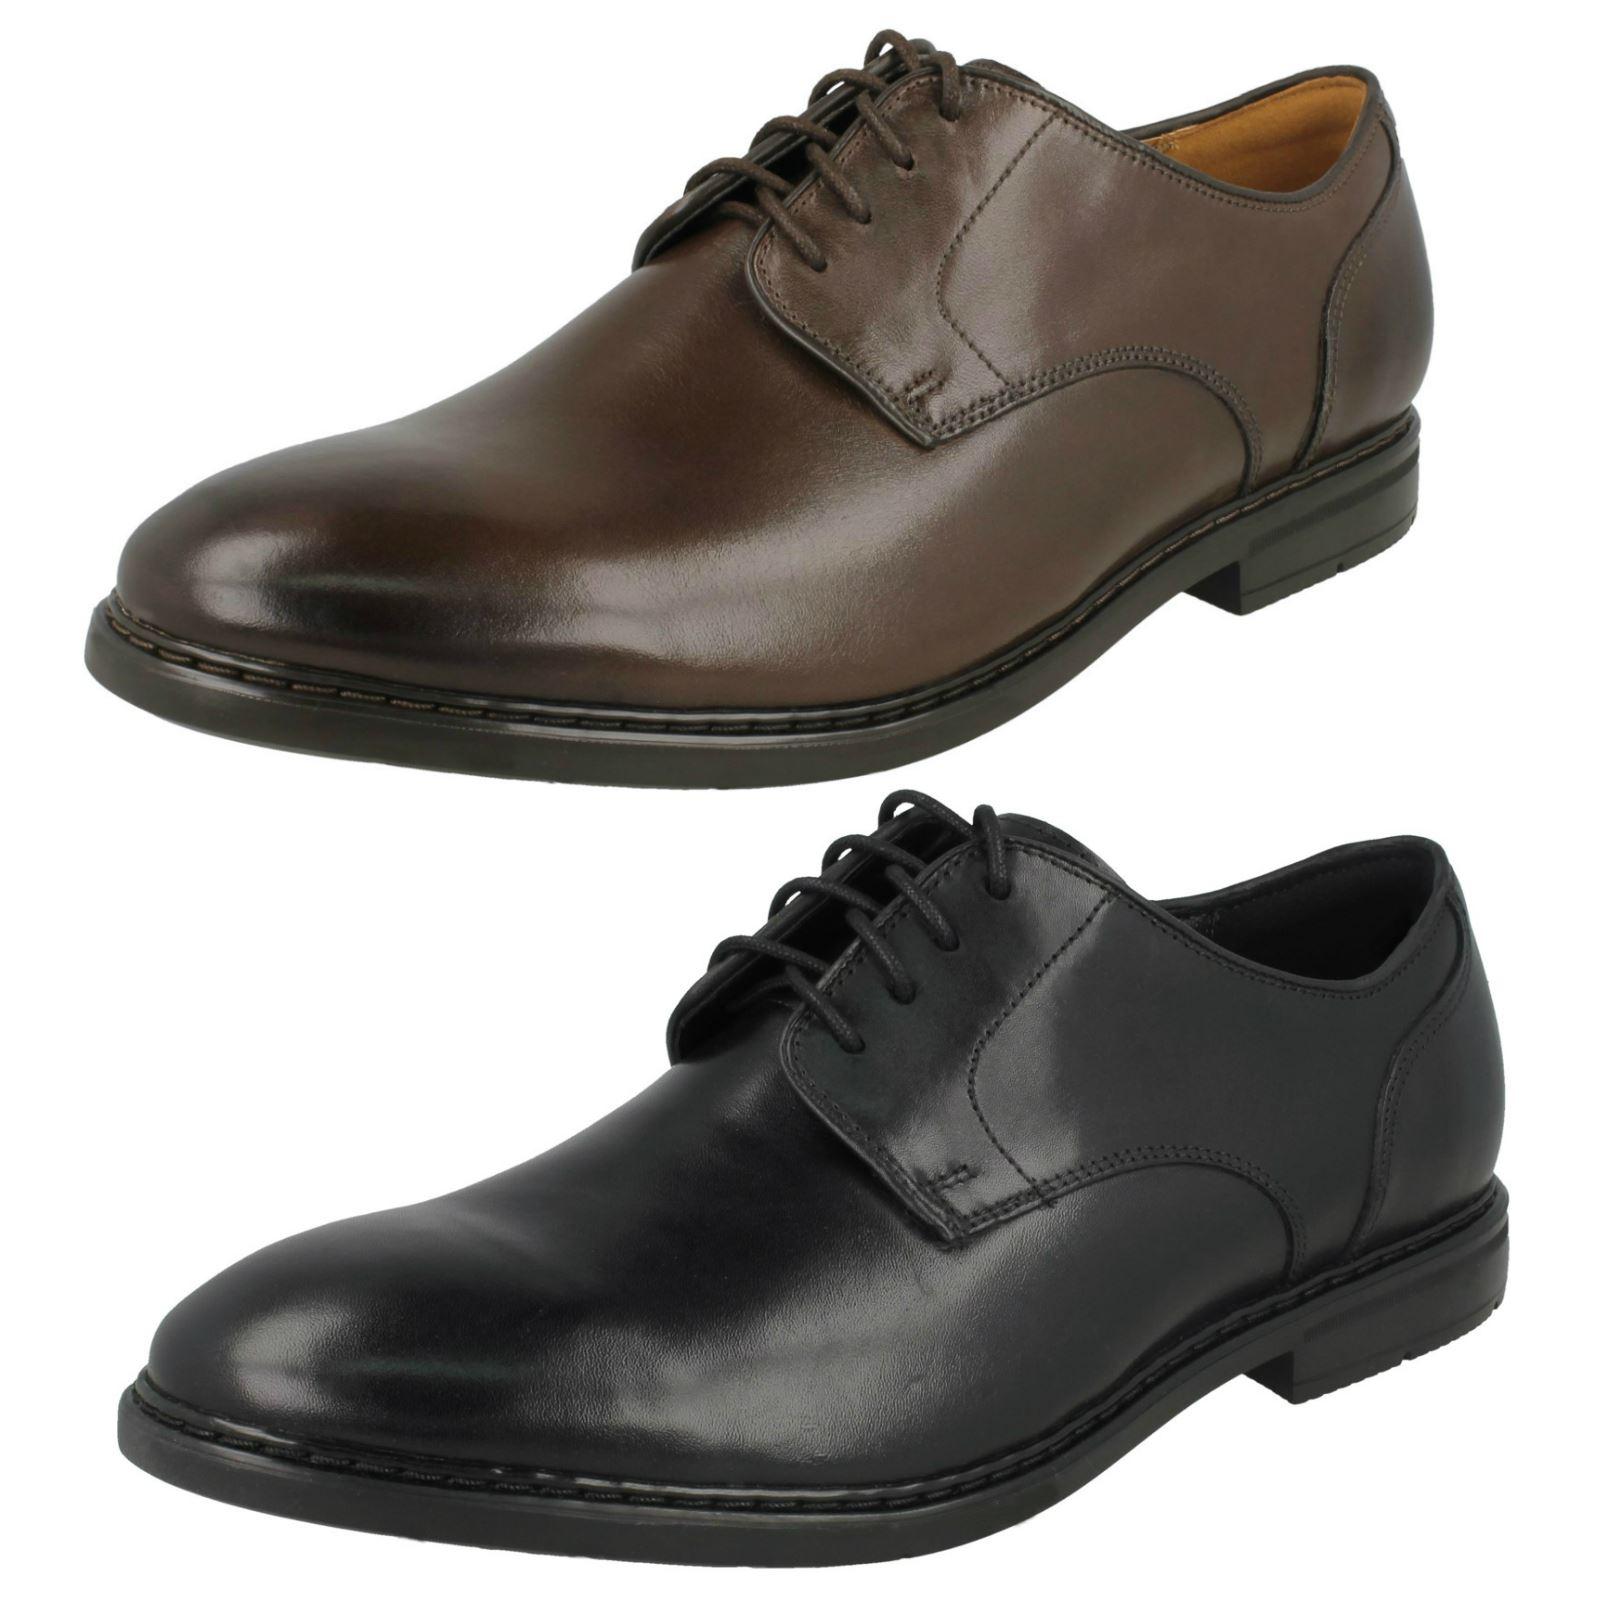 Mens Clarks Formal Shoes 'Banbury Lace